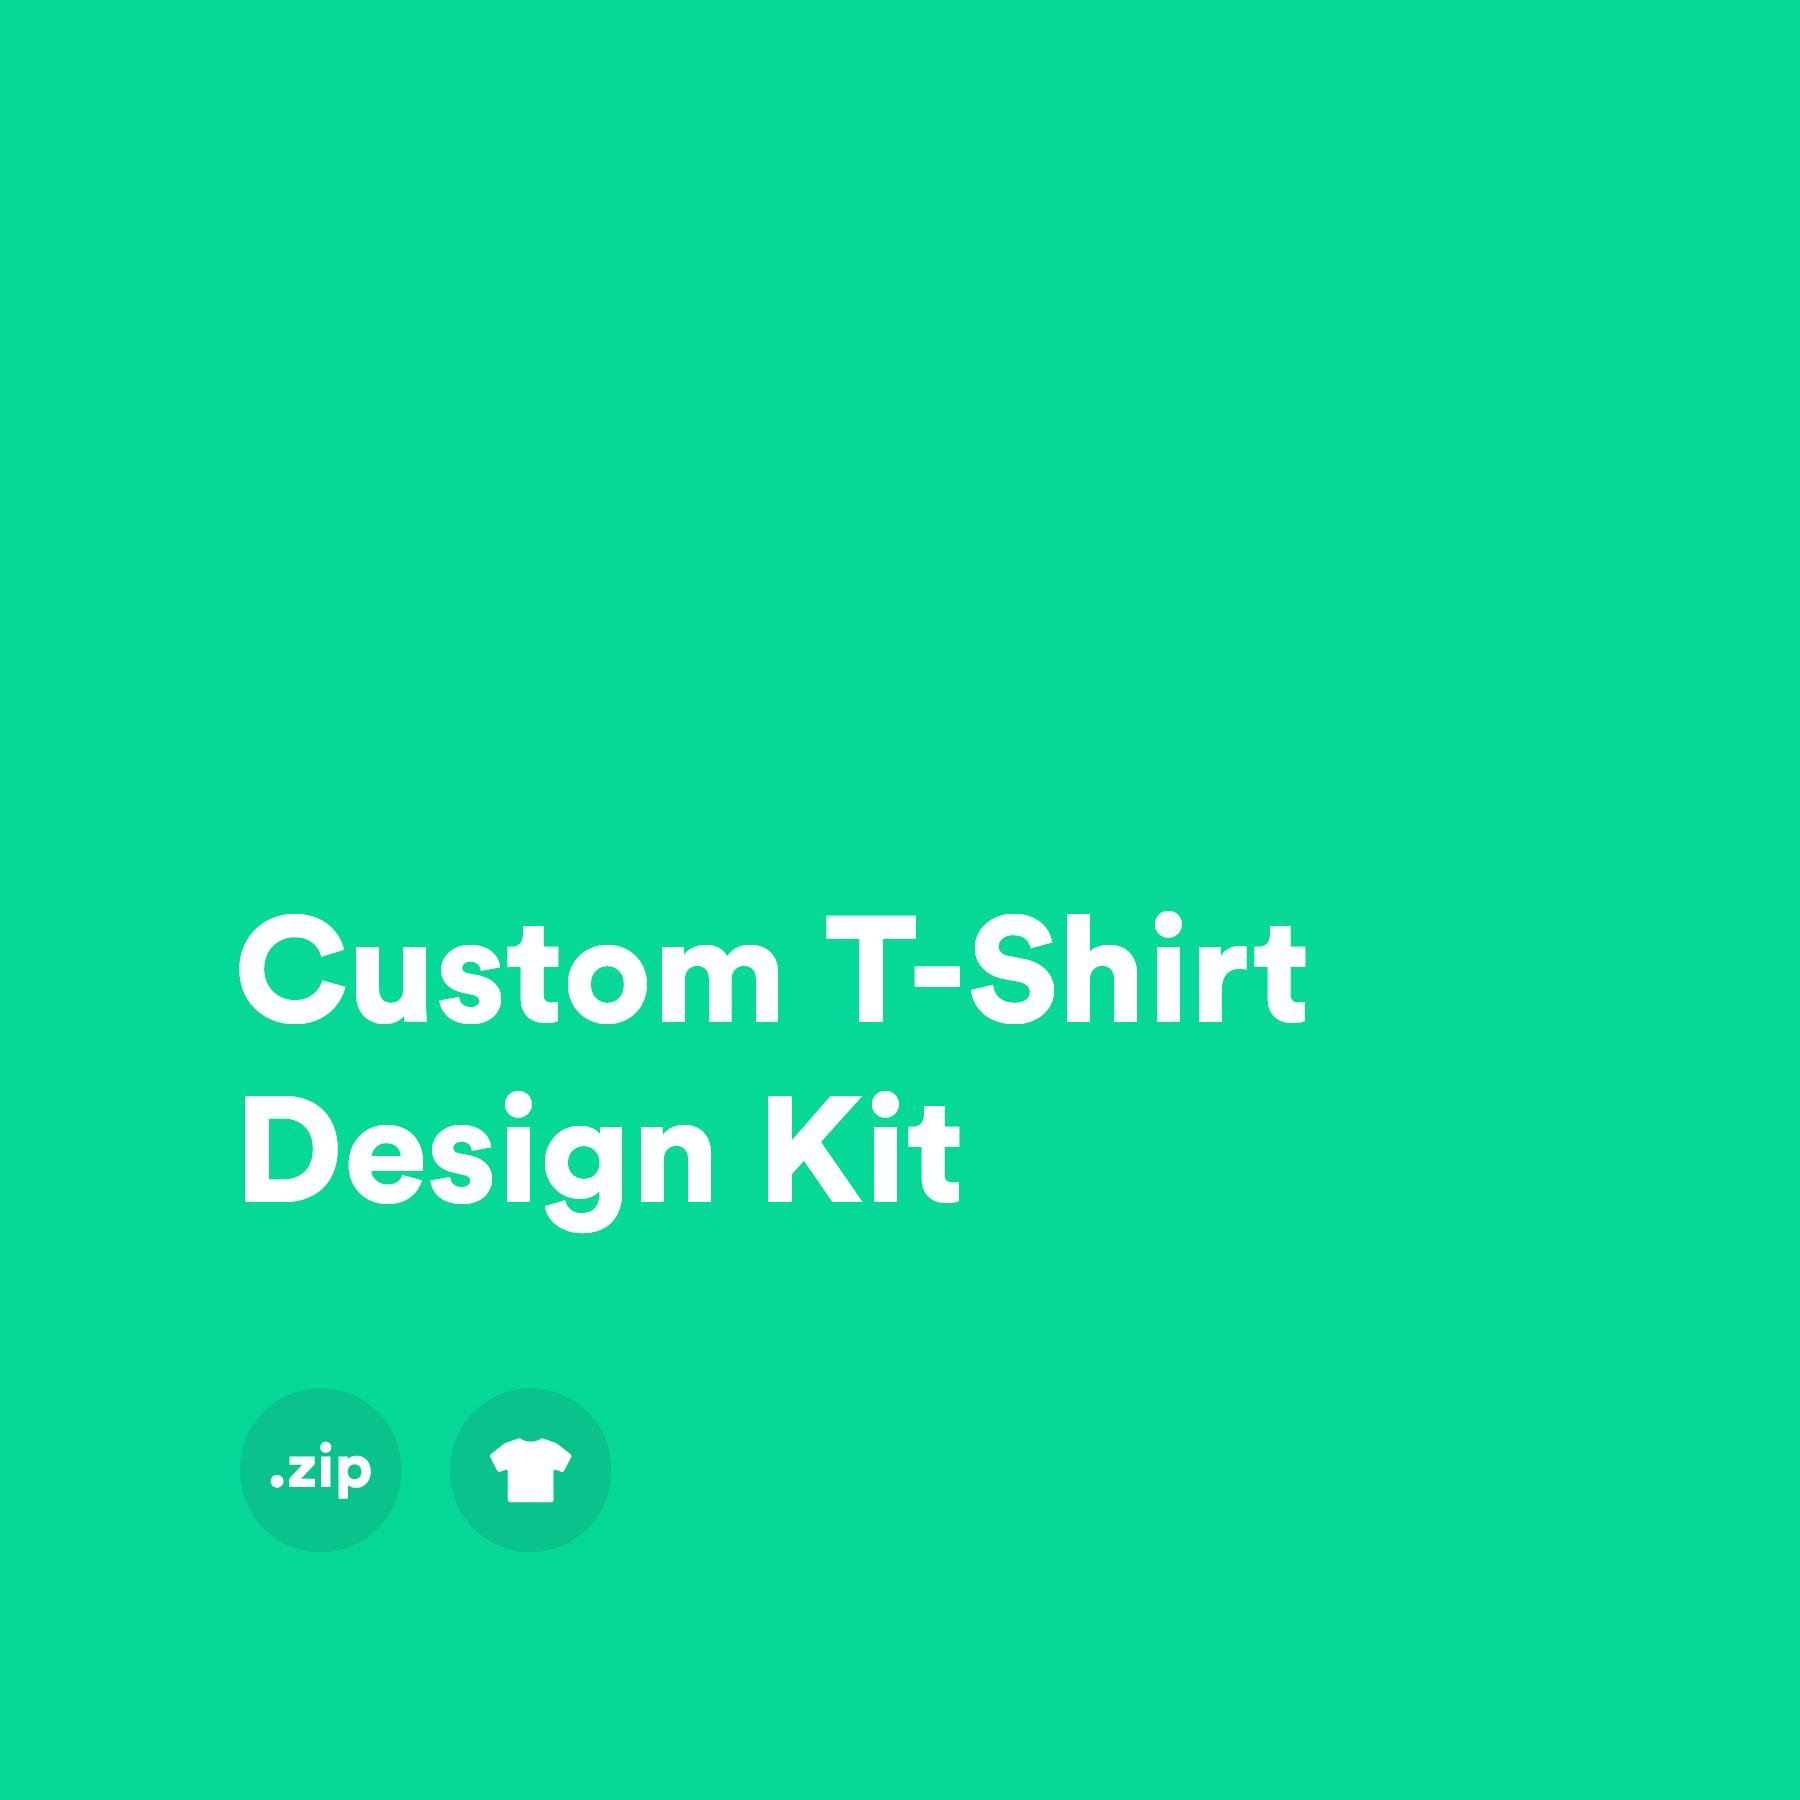 Custom T-shirt Design Kit